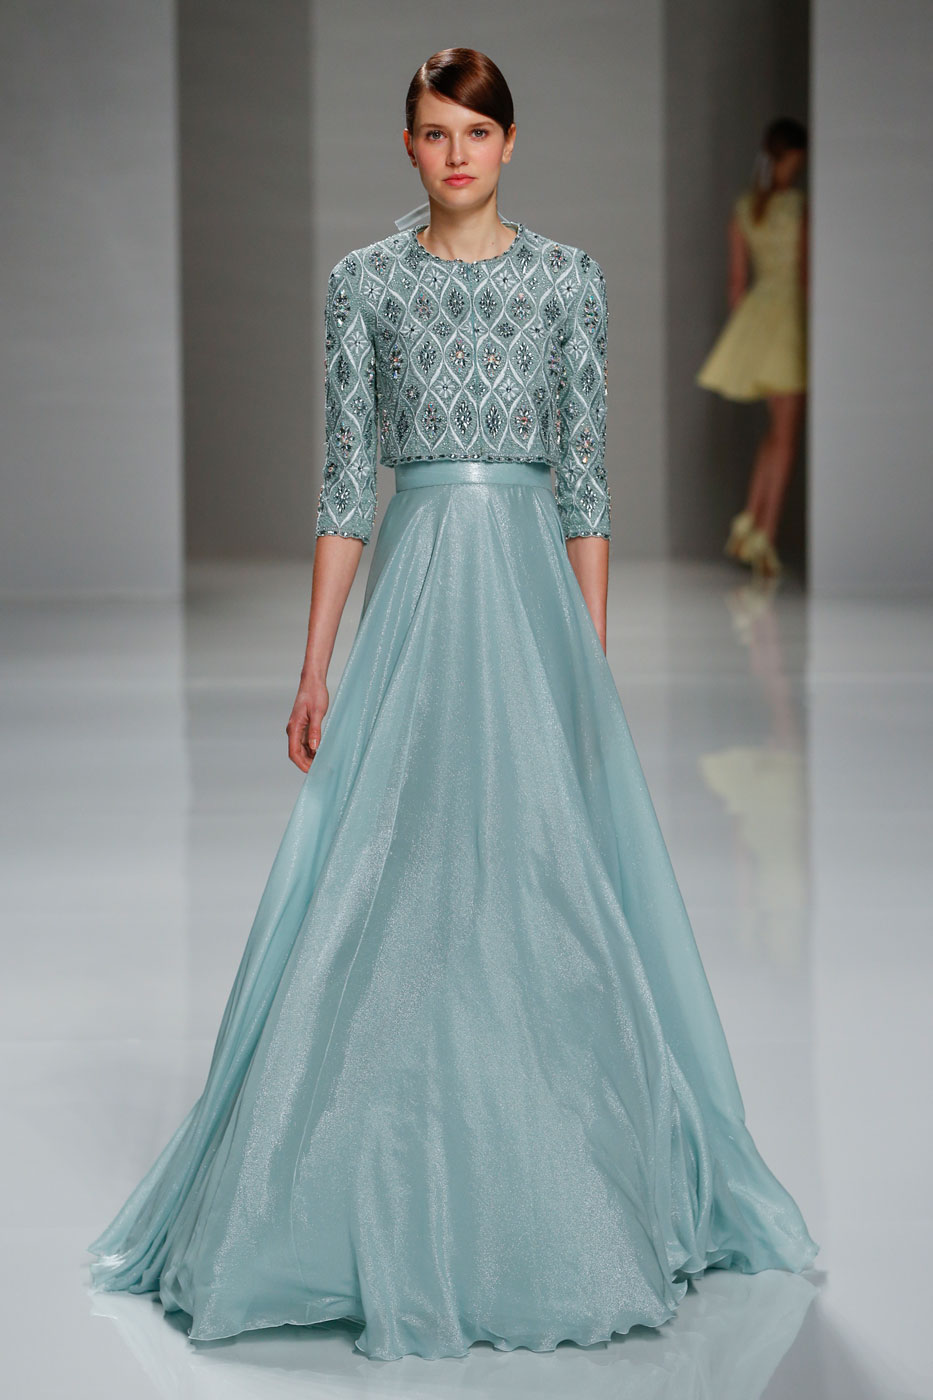 Georges-Hobeika-fashion-runway-show-haute-couture-paris-spring-2015-the-impression-19